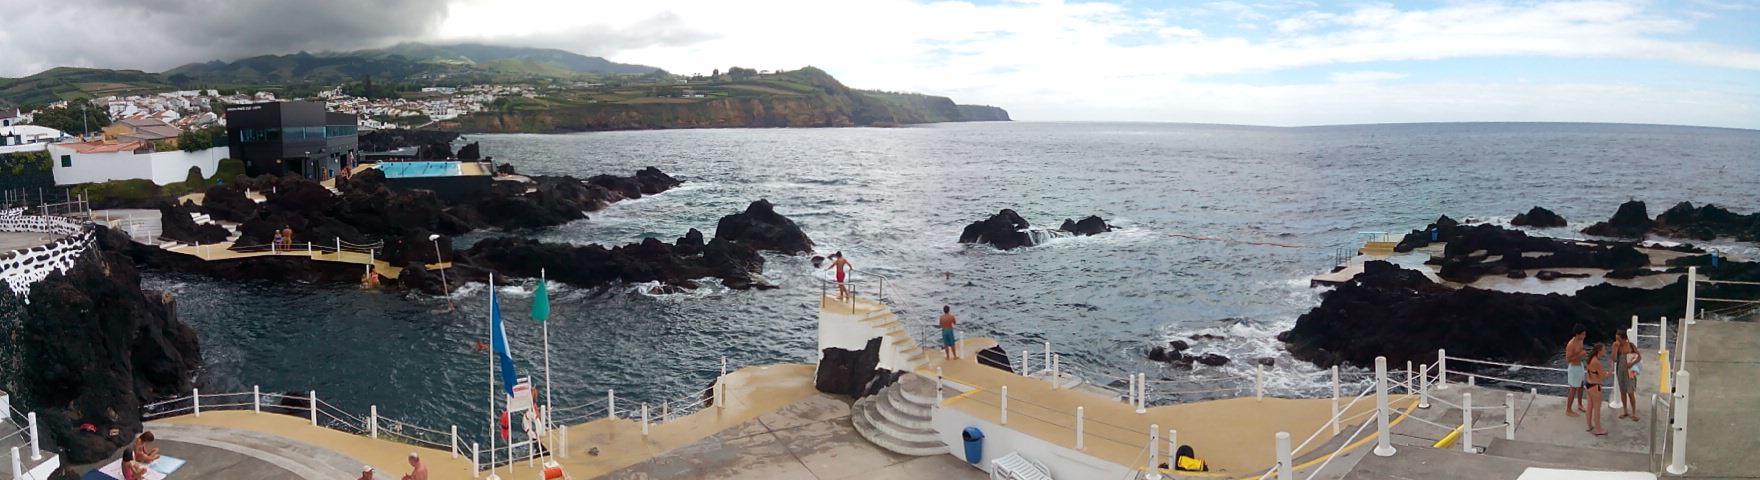 MOSTEIROS | Andoni Garai (Oñati). Azores.